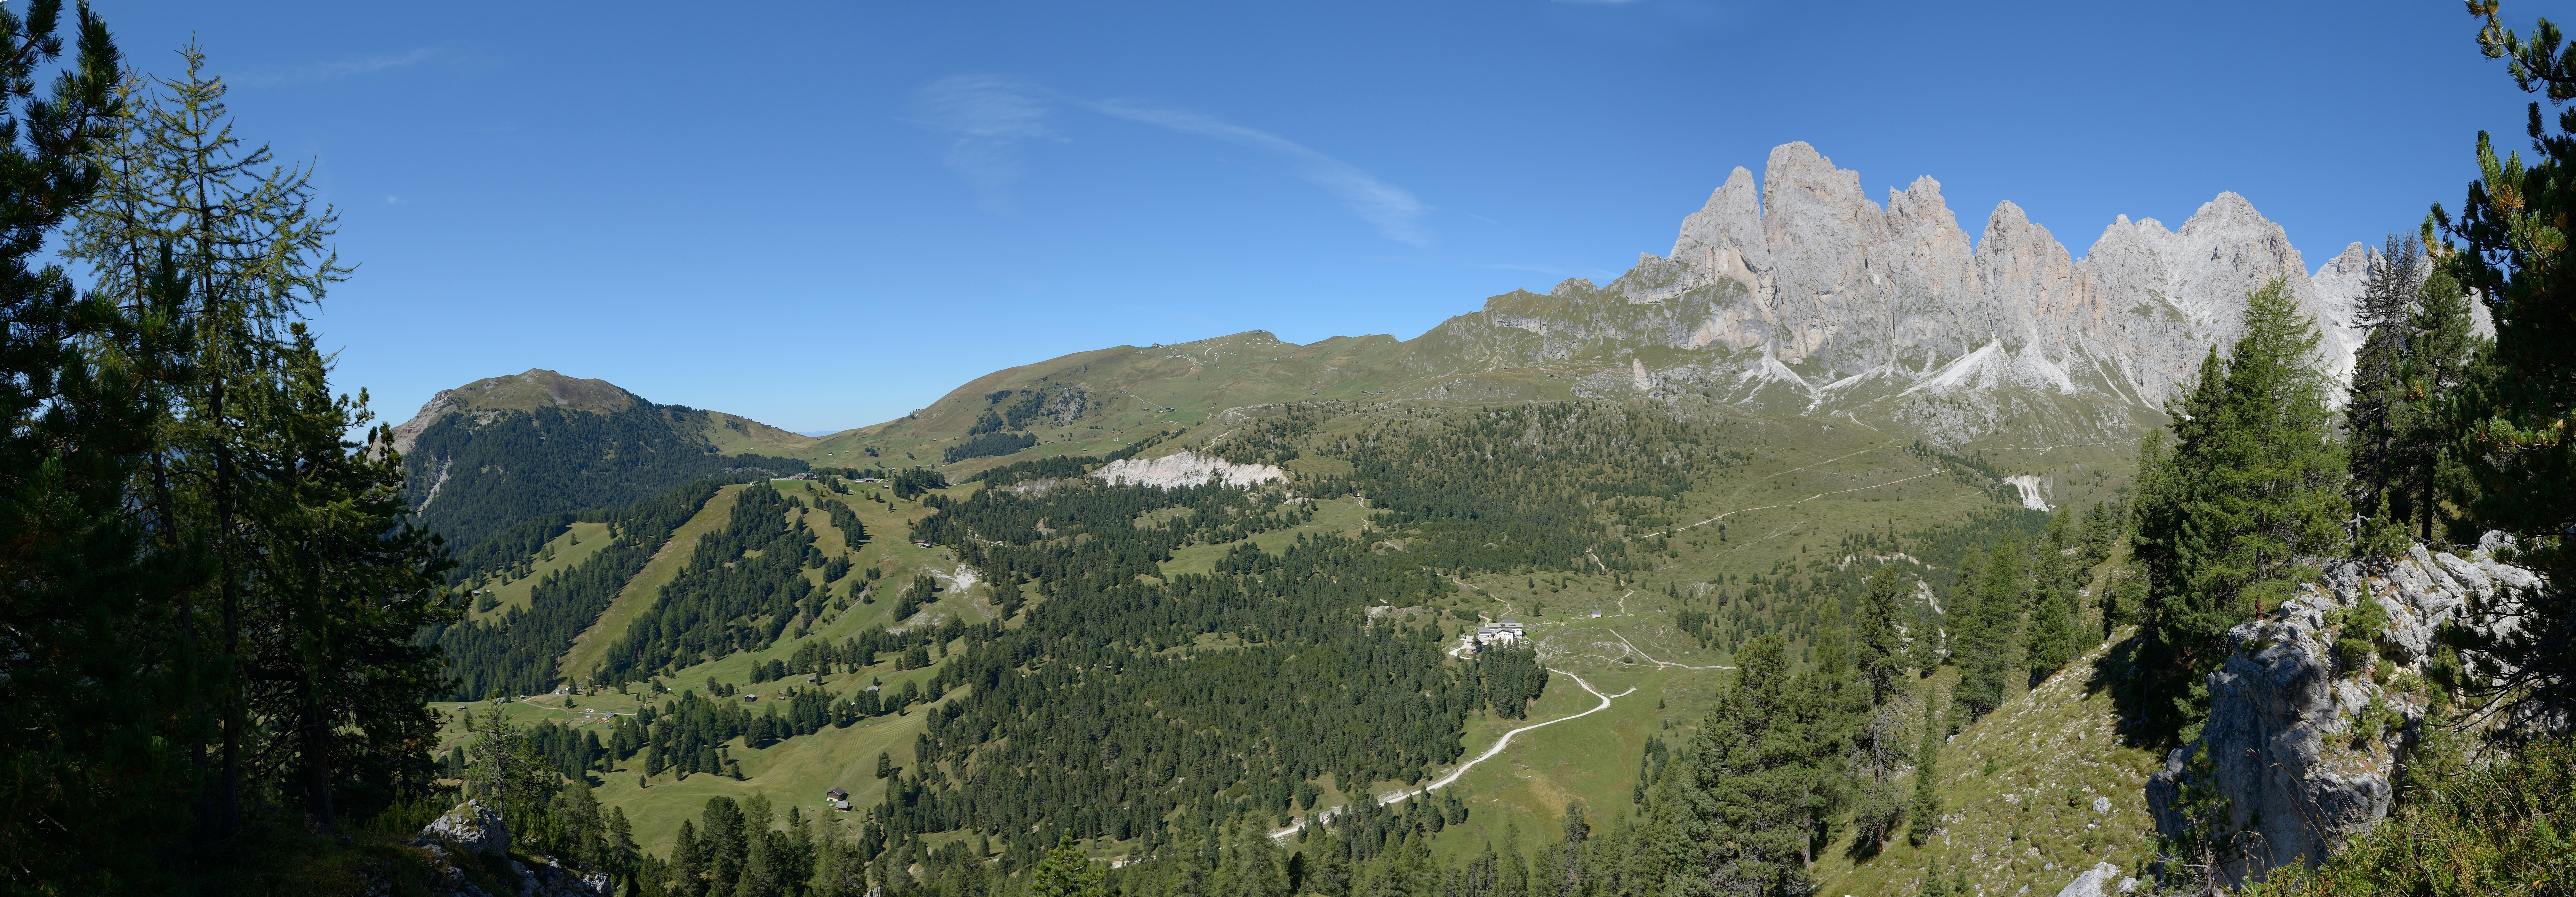 Http Commons Wikimedia Org Wiki File Pic Mont De Mastle Y Ncisles Jpg